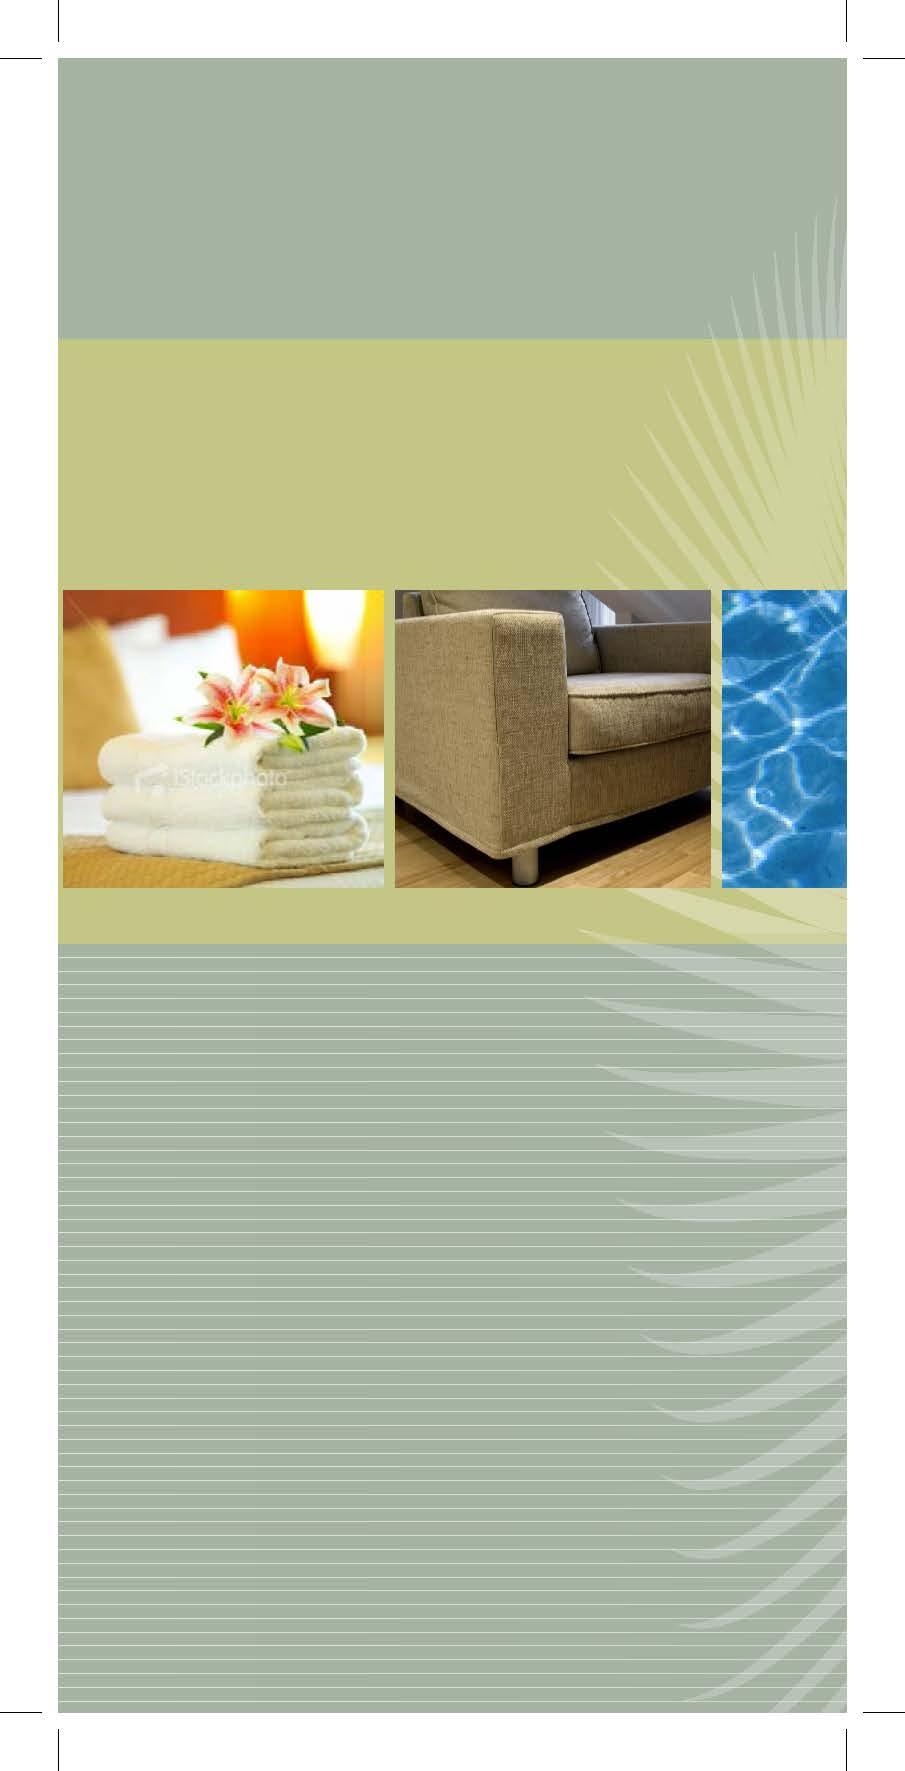 Pavilion DL pamphlet cover_Page_09